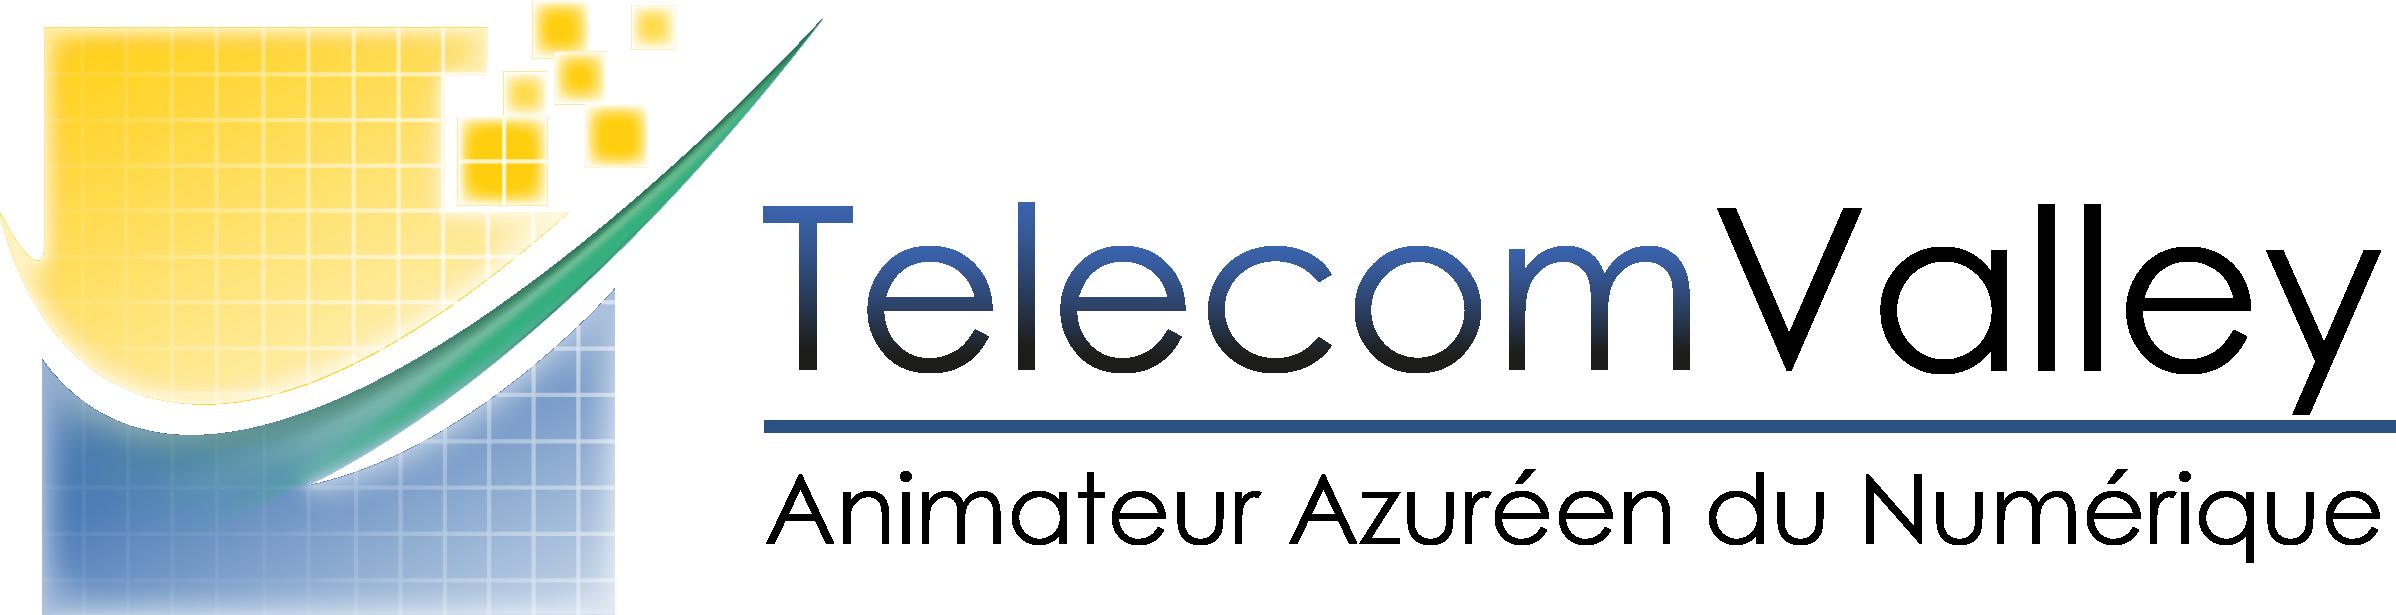 Telecom Valley_FR 2015 RVB.png